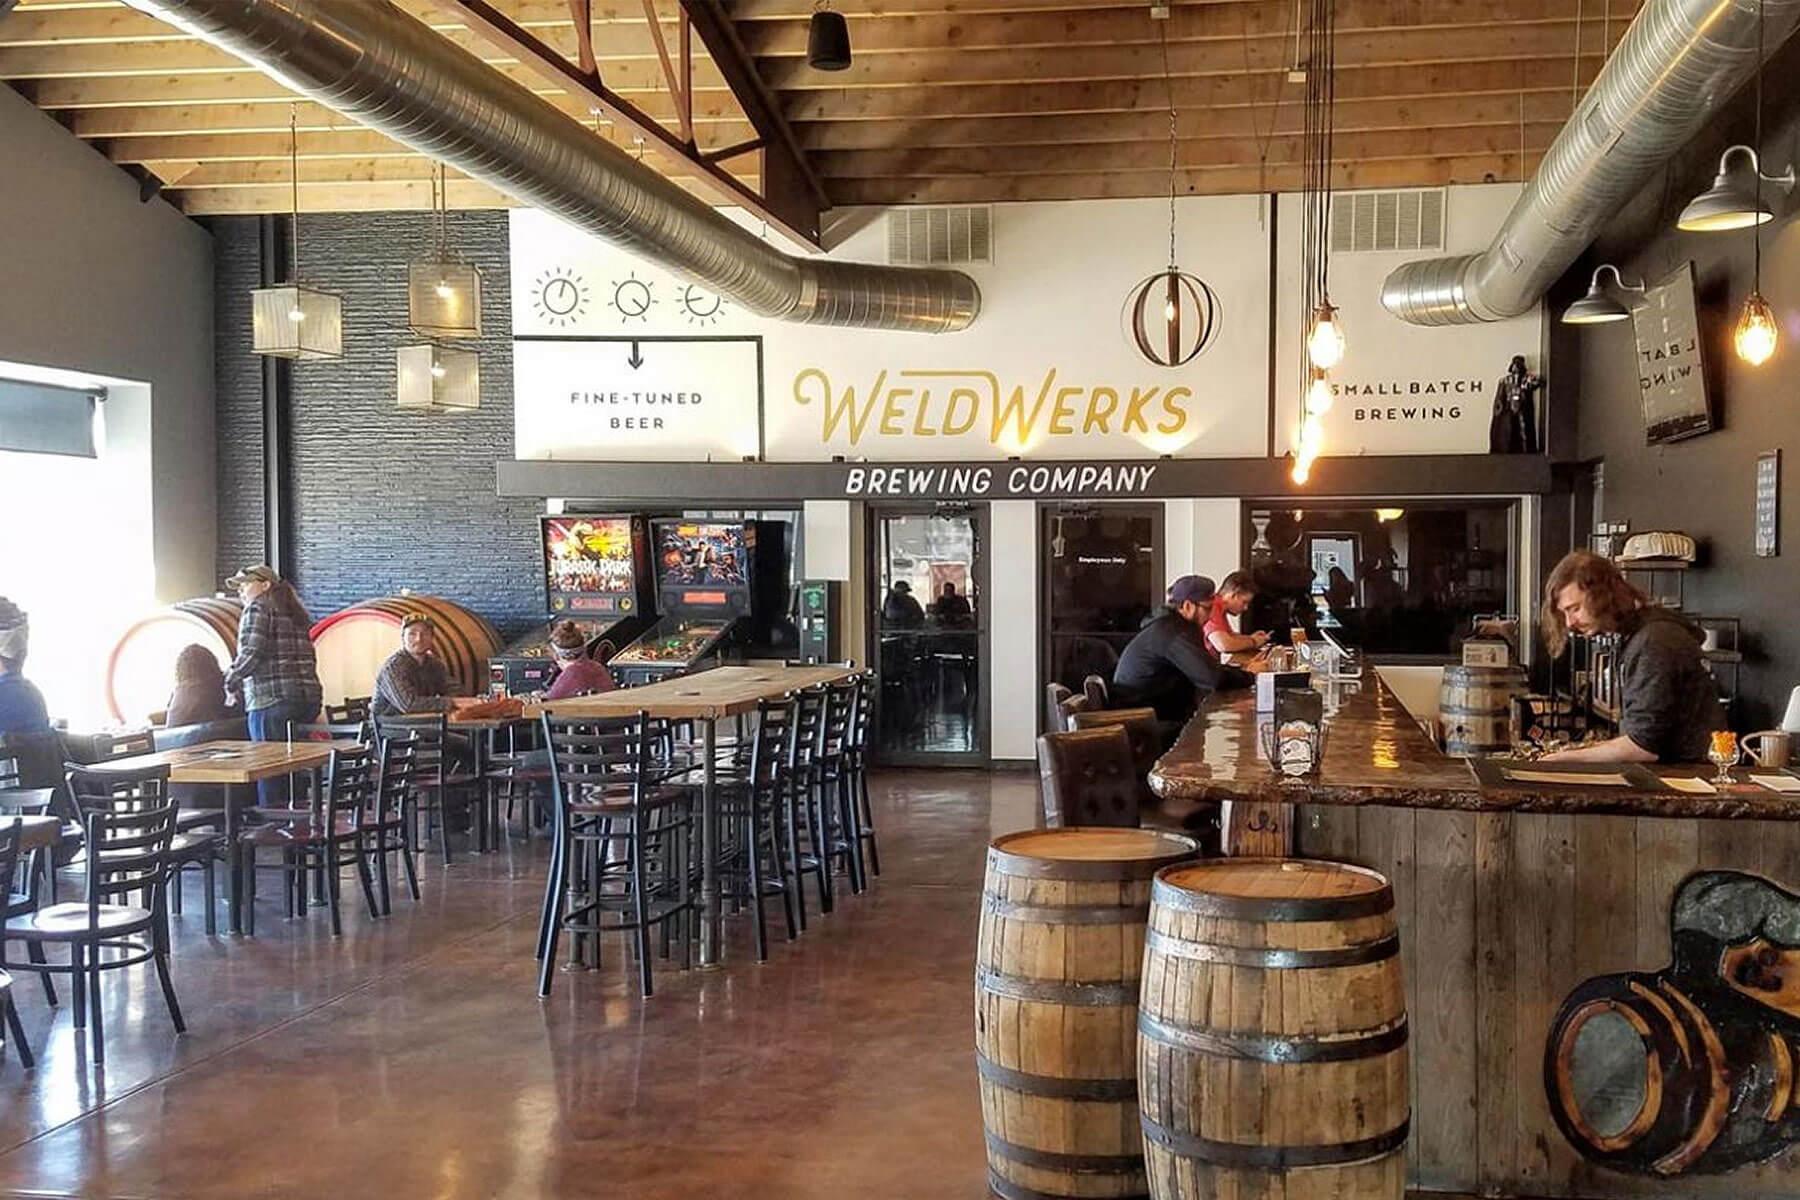 Inside the WeldWerks Brewing Co. taproom in Greeley, Colorado